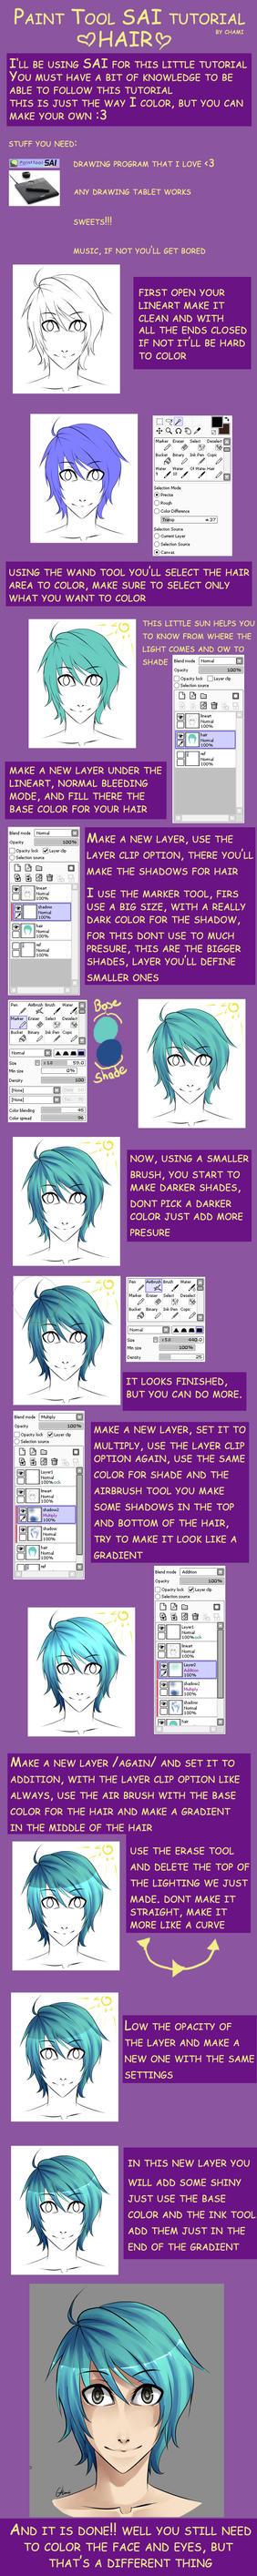 Hair tutorial by Chami-ryokuroi